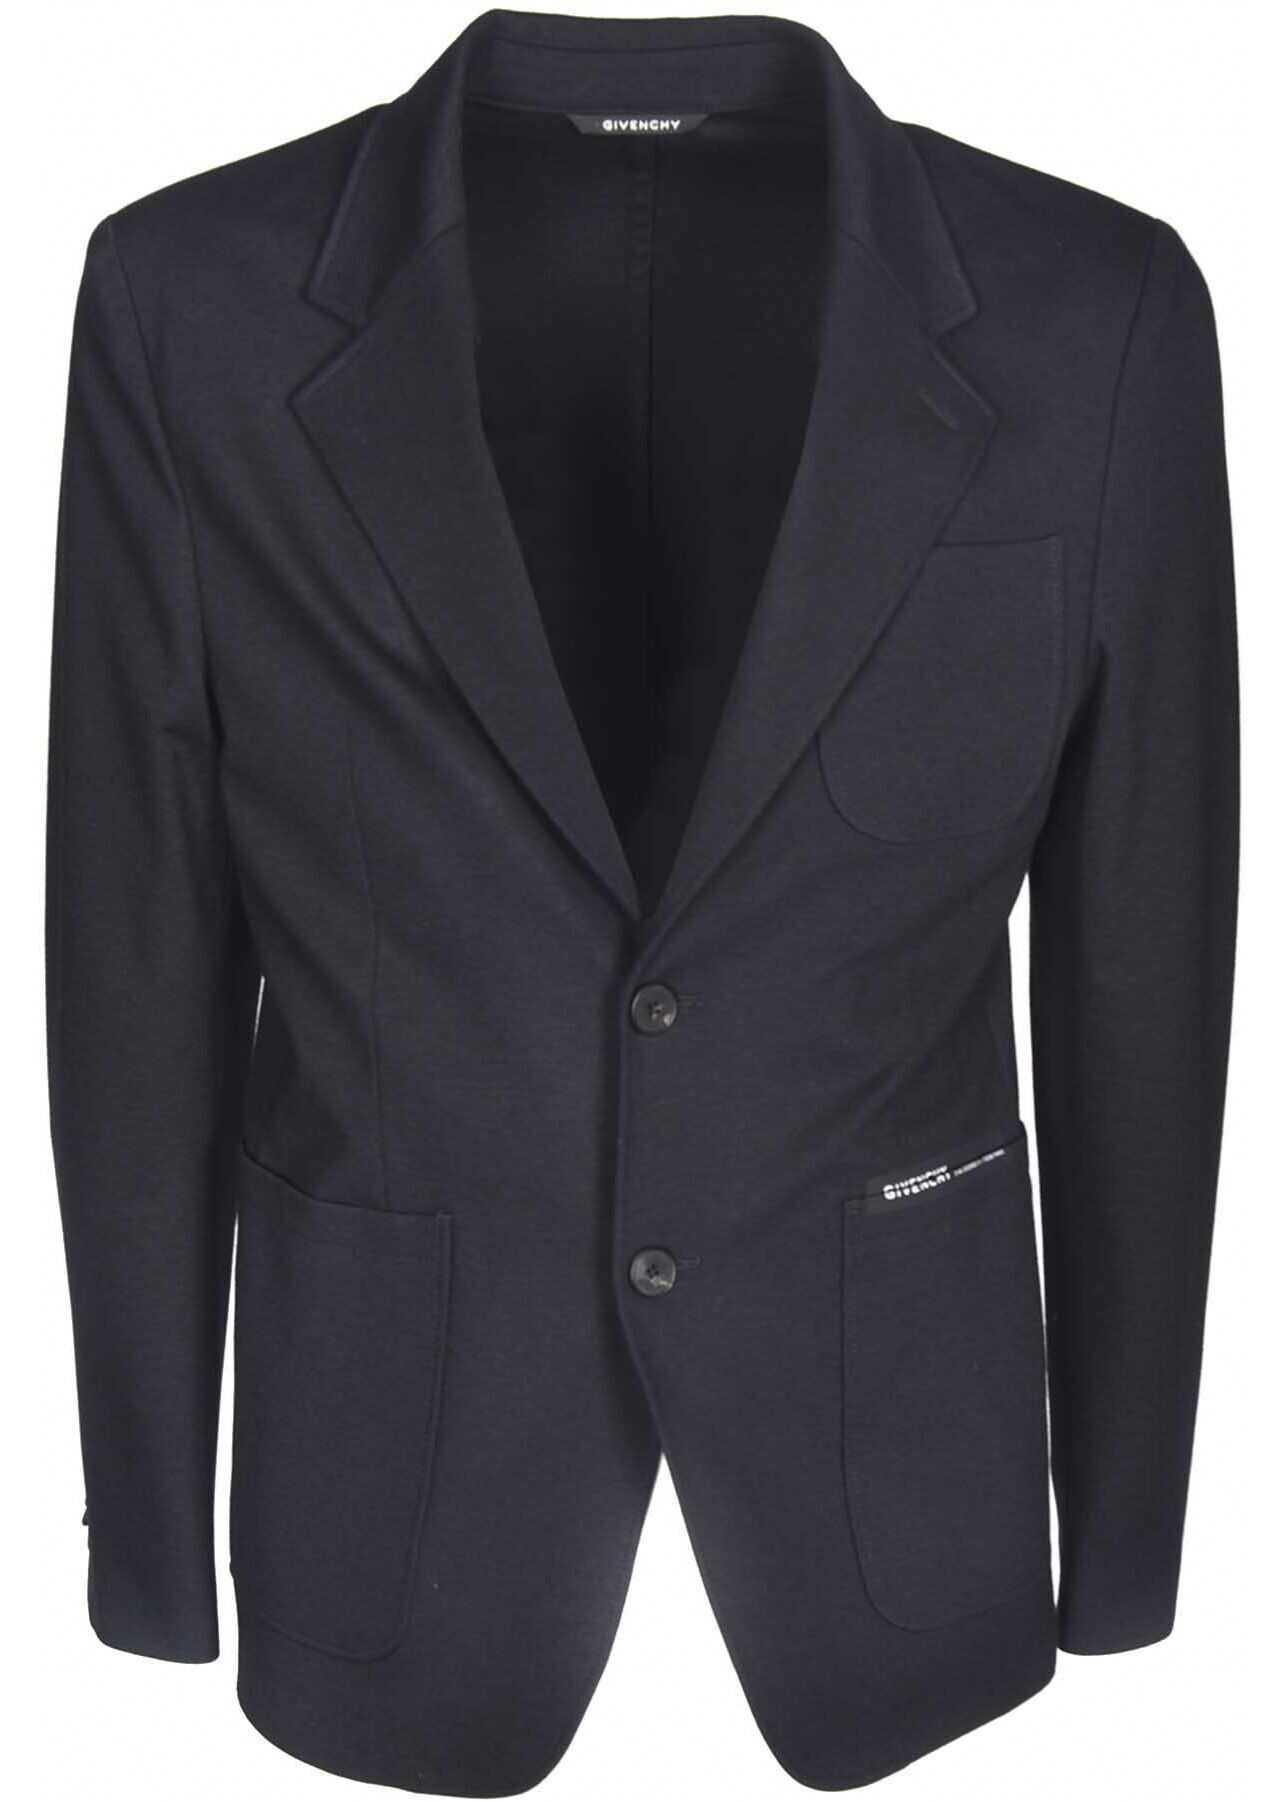 Givenchy Single-Breasted Branded Jacket In Black Black imagine